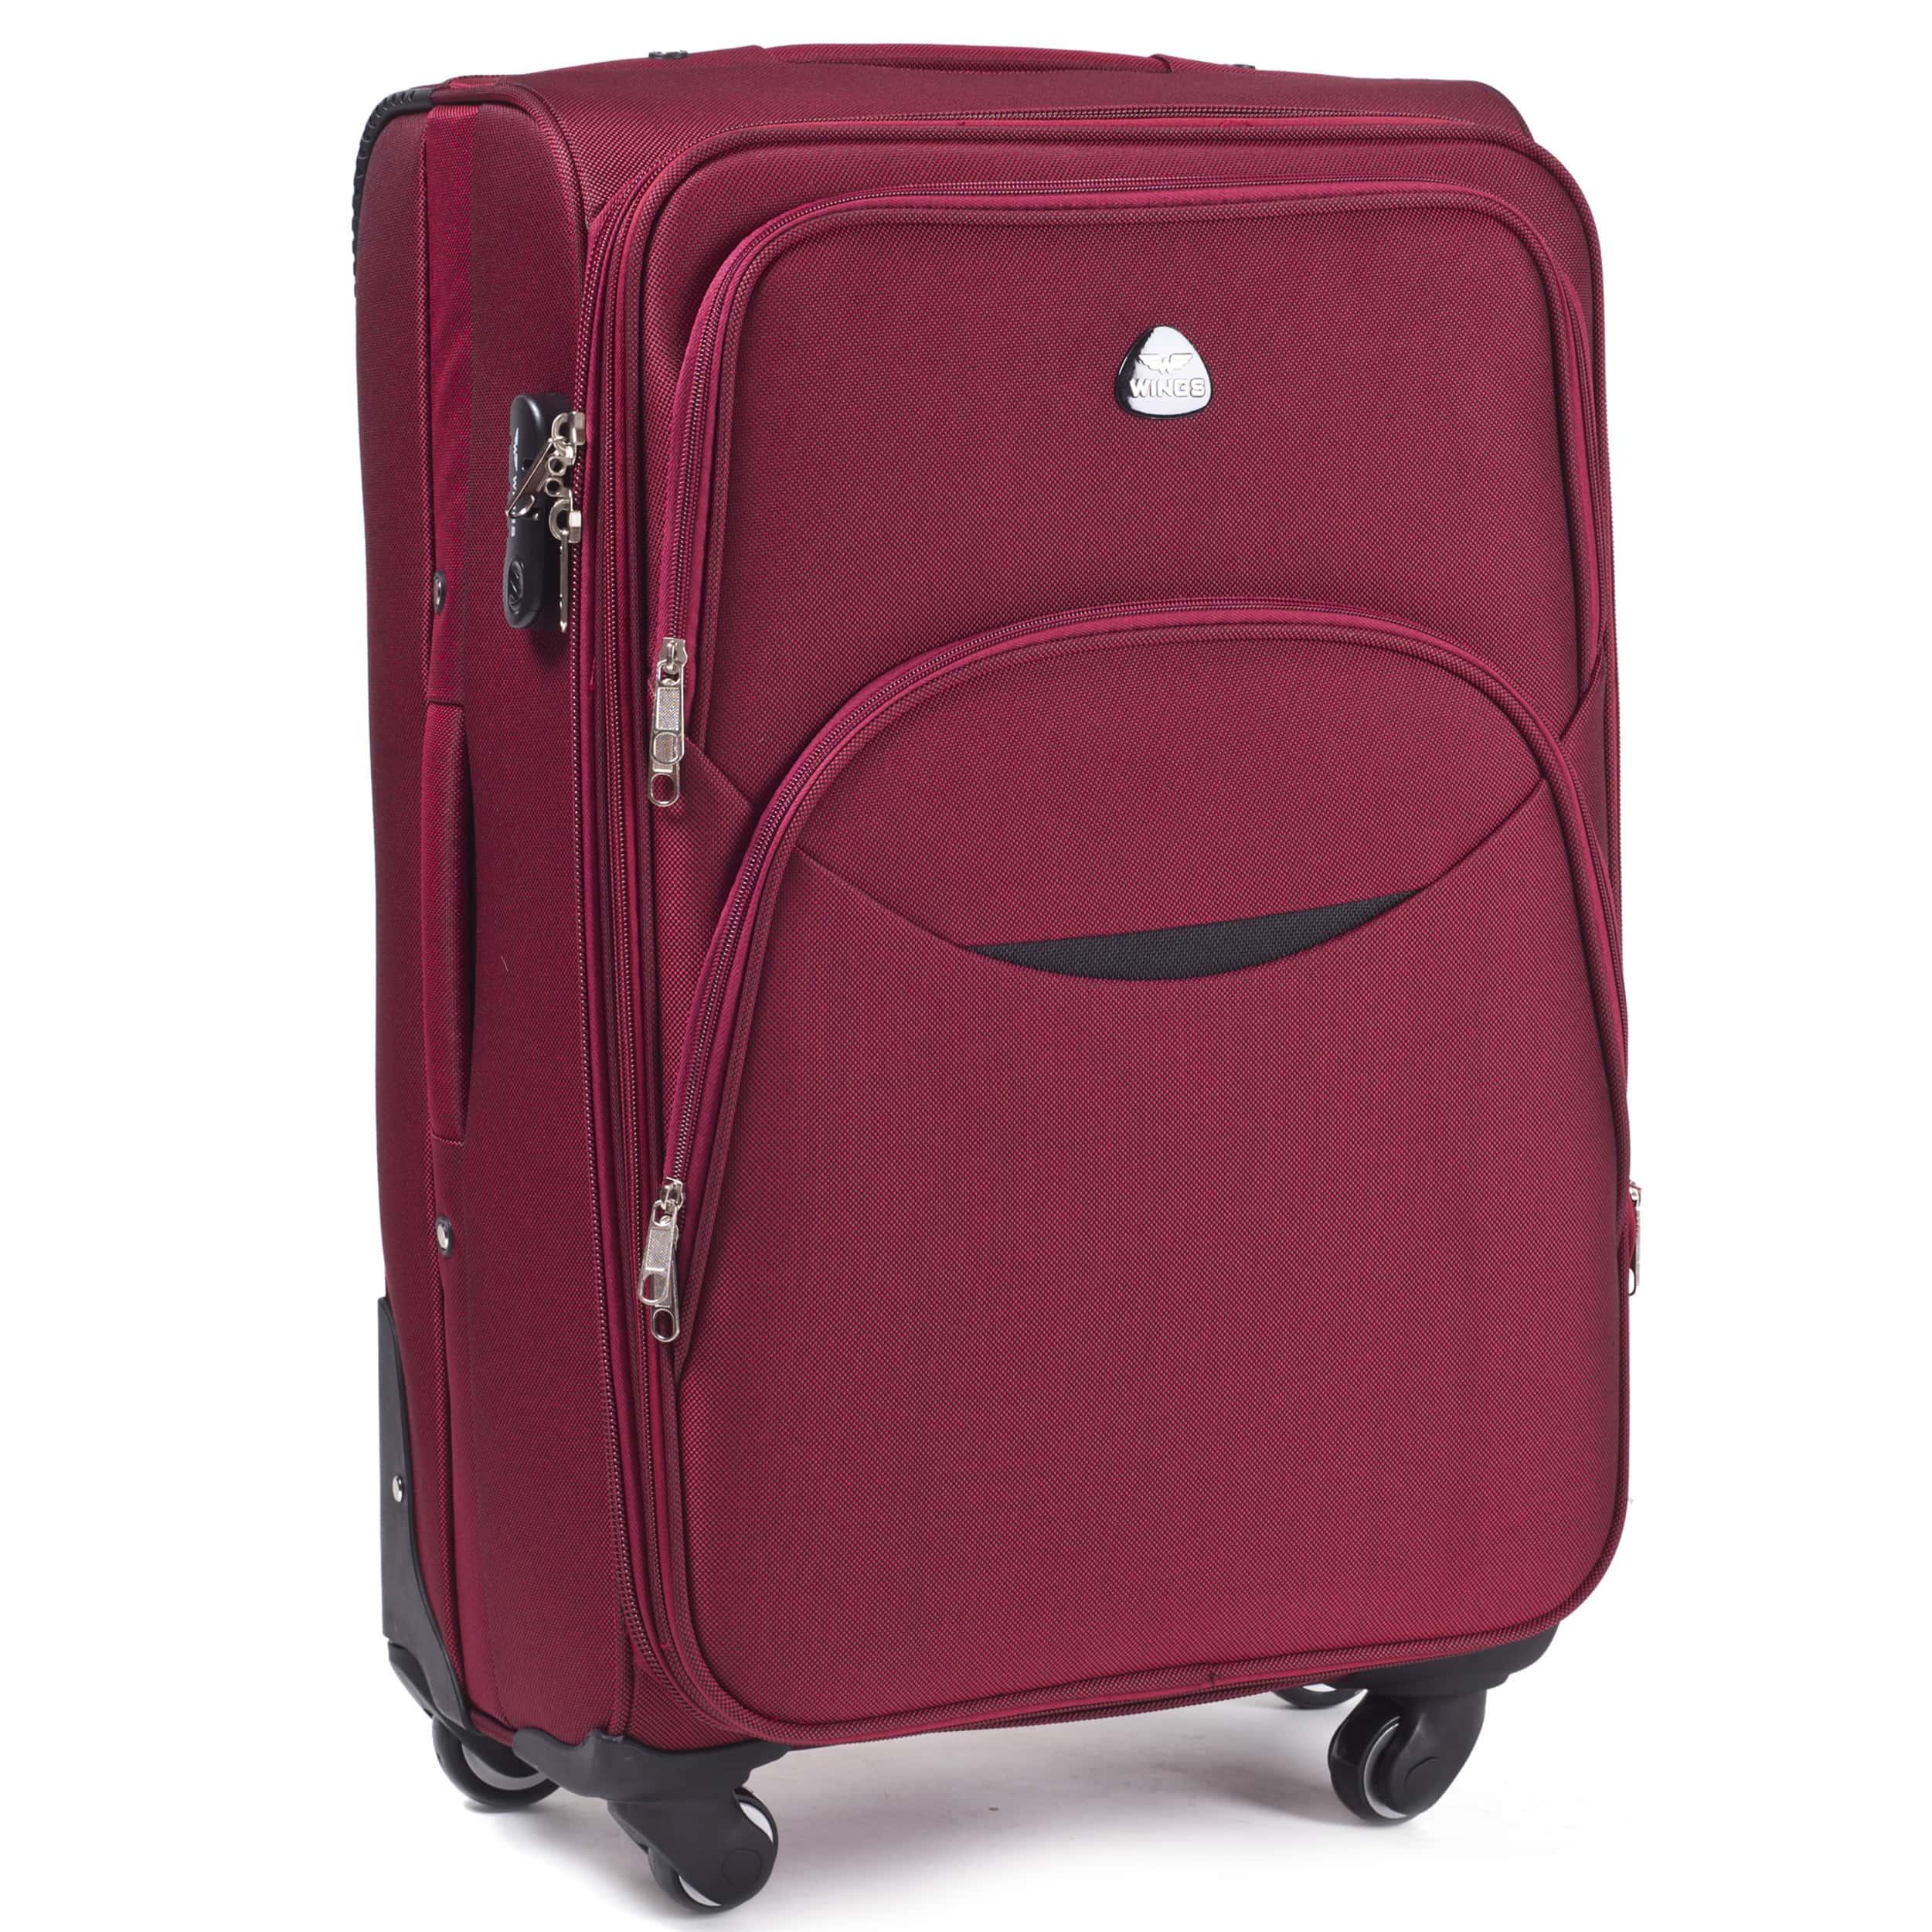 Большой Тканевый Чемодан Wings 1708-4 L D.RED PREMIUM на 4-х прочных колесах! Для багажа,до 23 кг